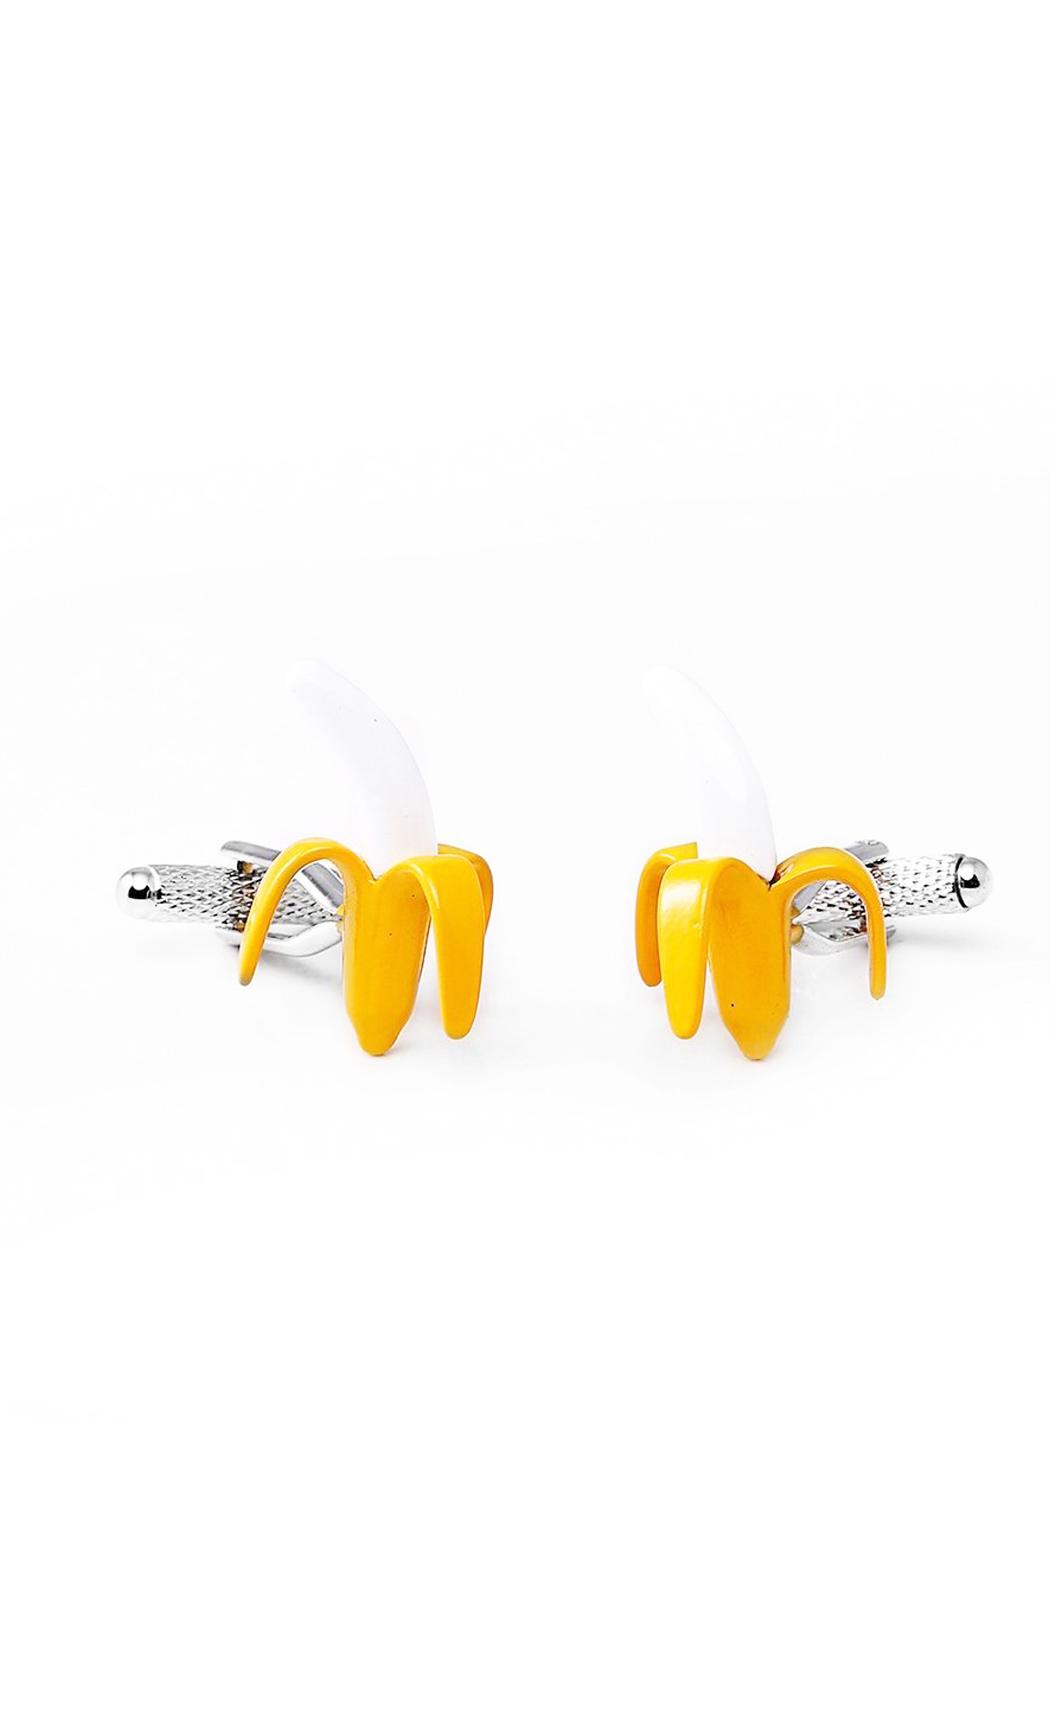 Yellow Banana Cufflink. Buy Online